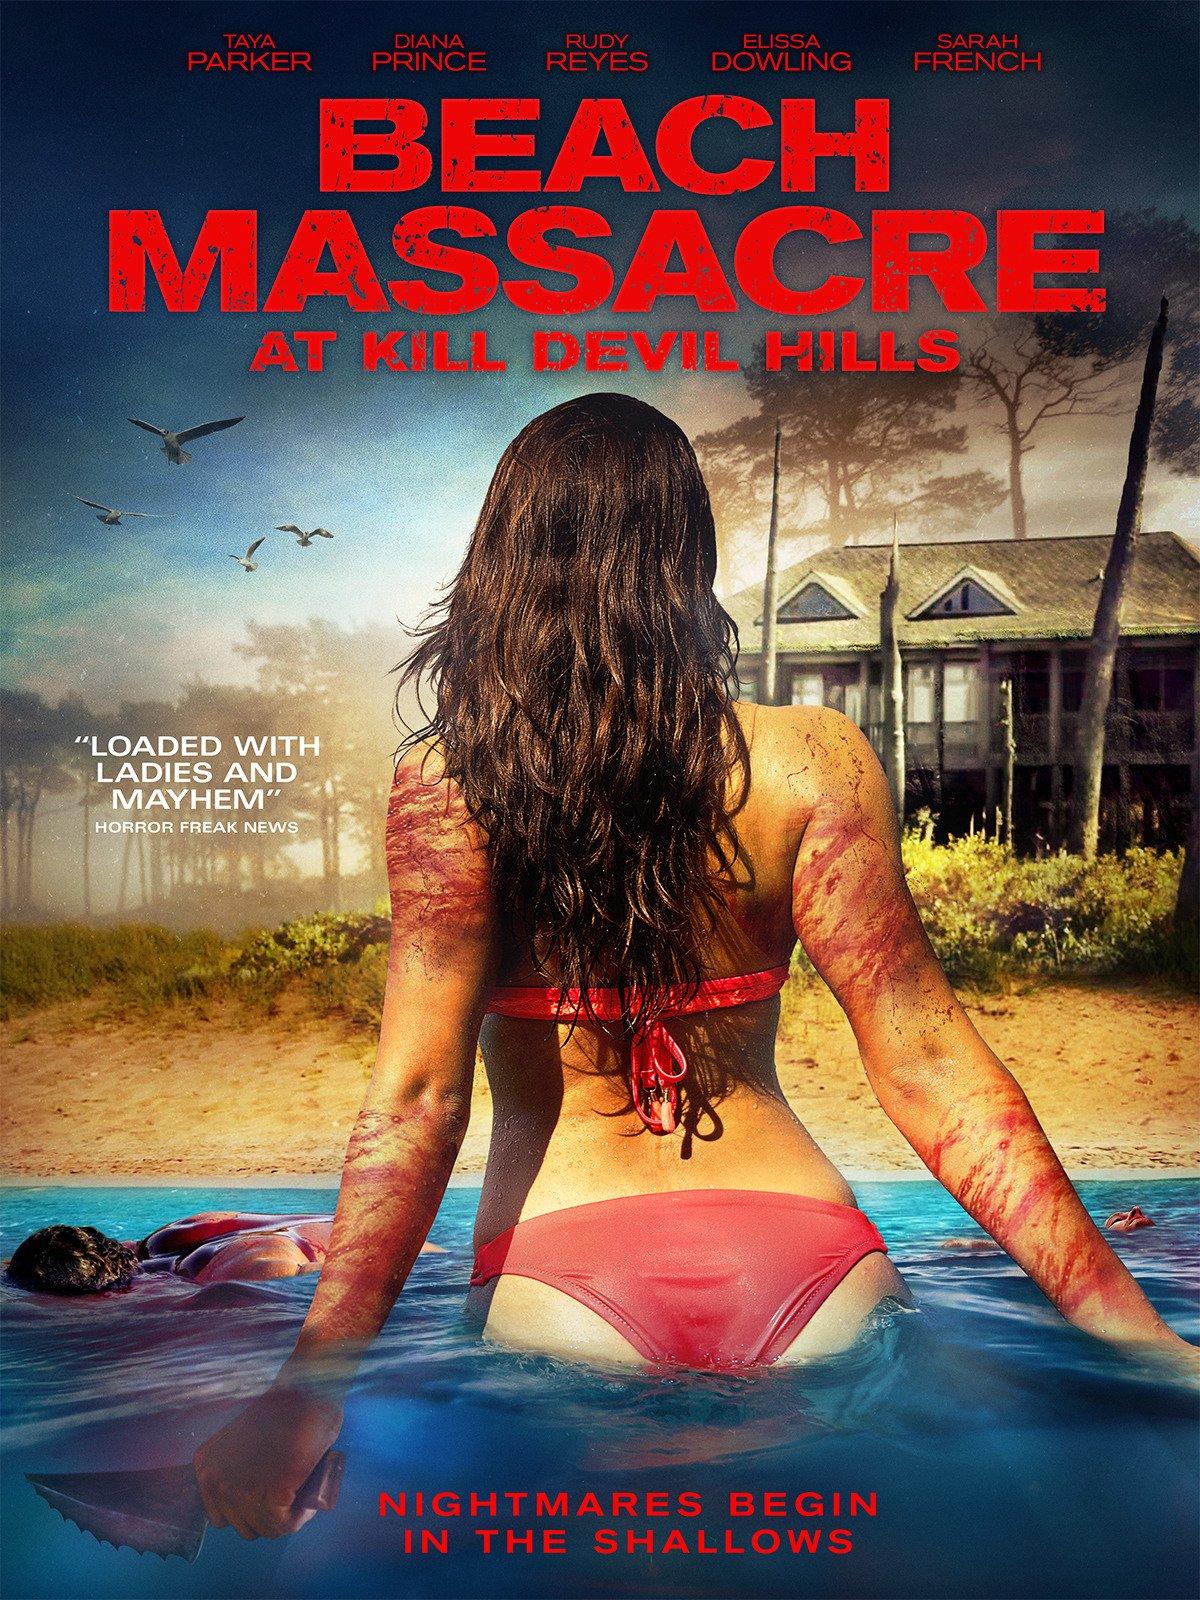 Beach Massacre at Kill Devil Hills on Amazon Prime Video UK